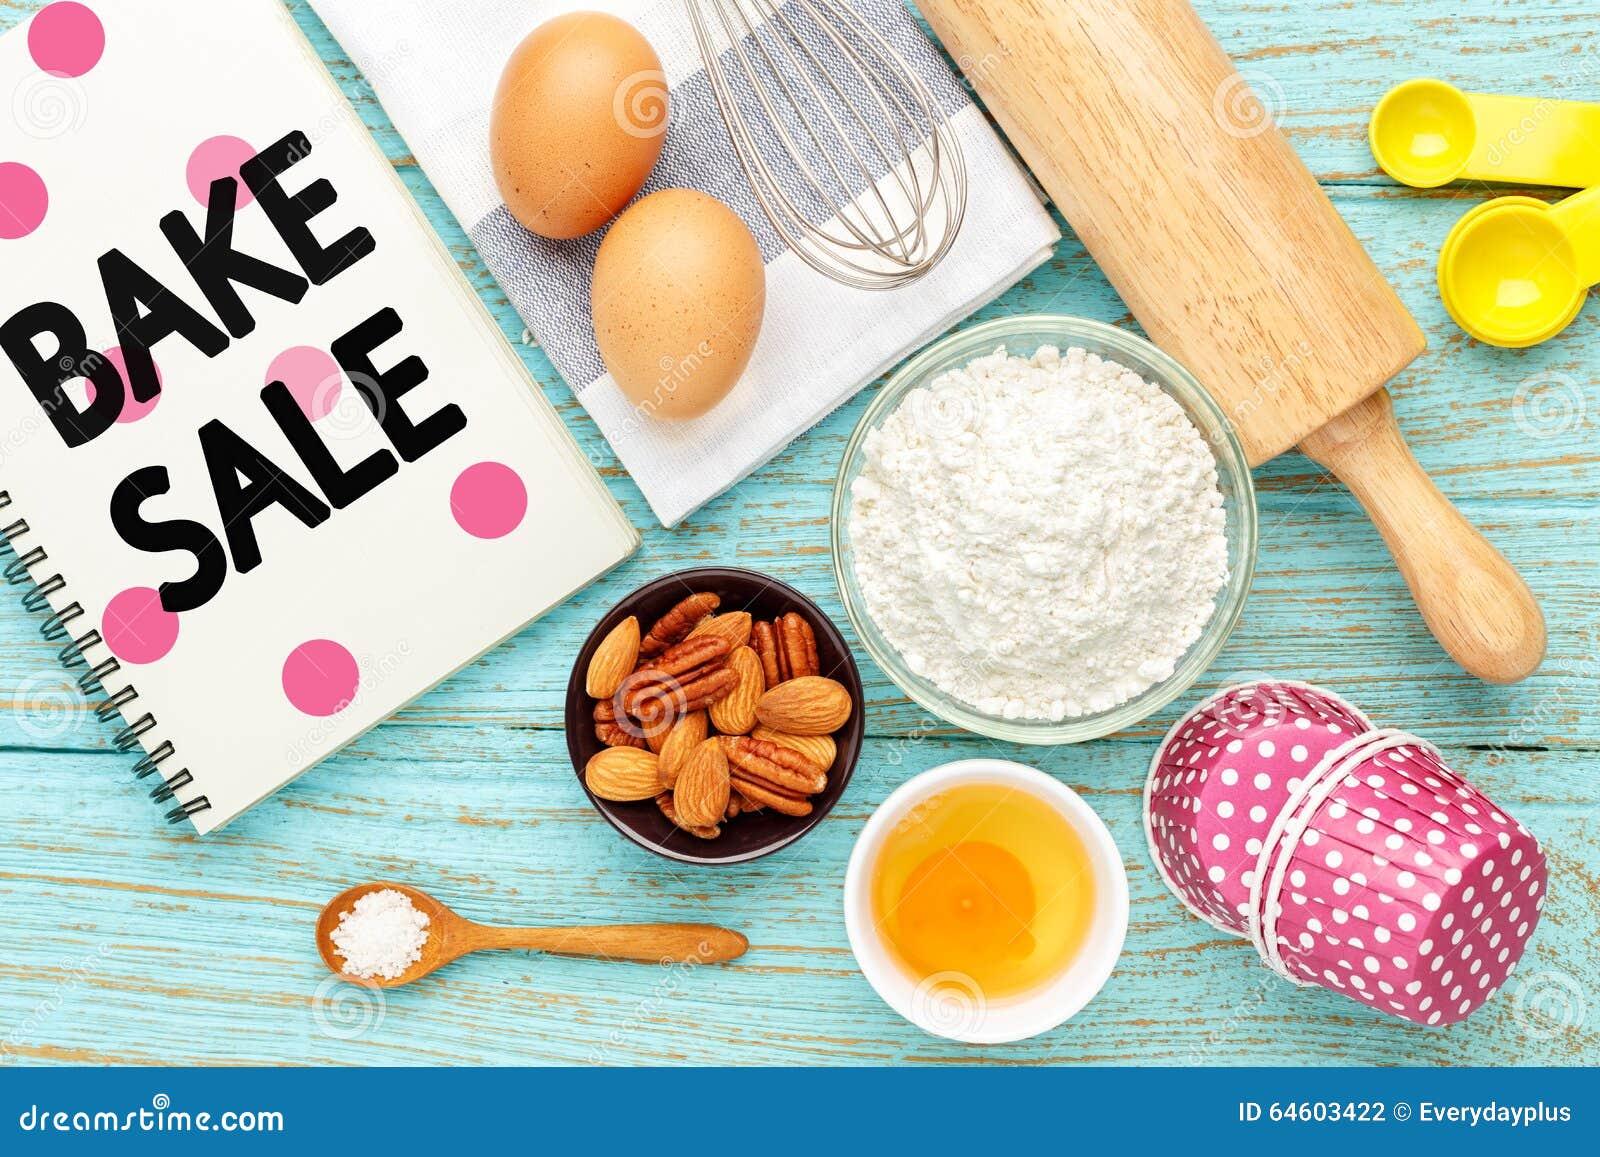 bake sale with baking ingredients stock photo - image of kitchen